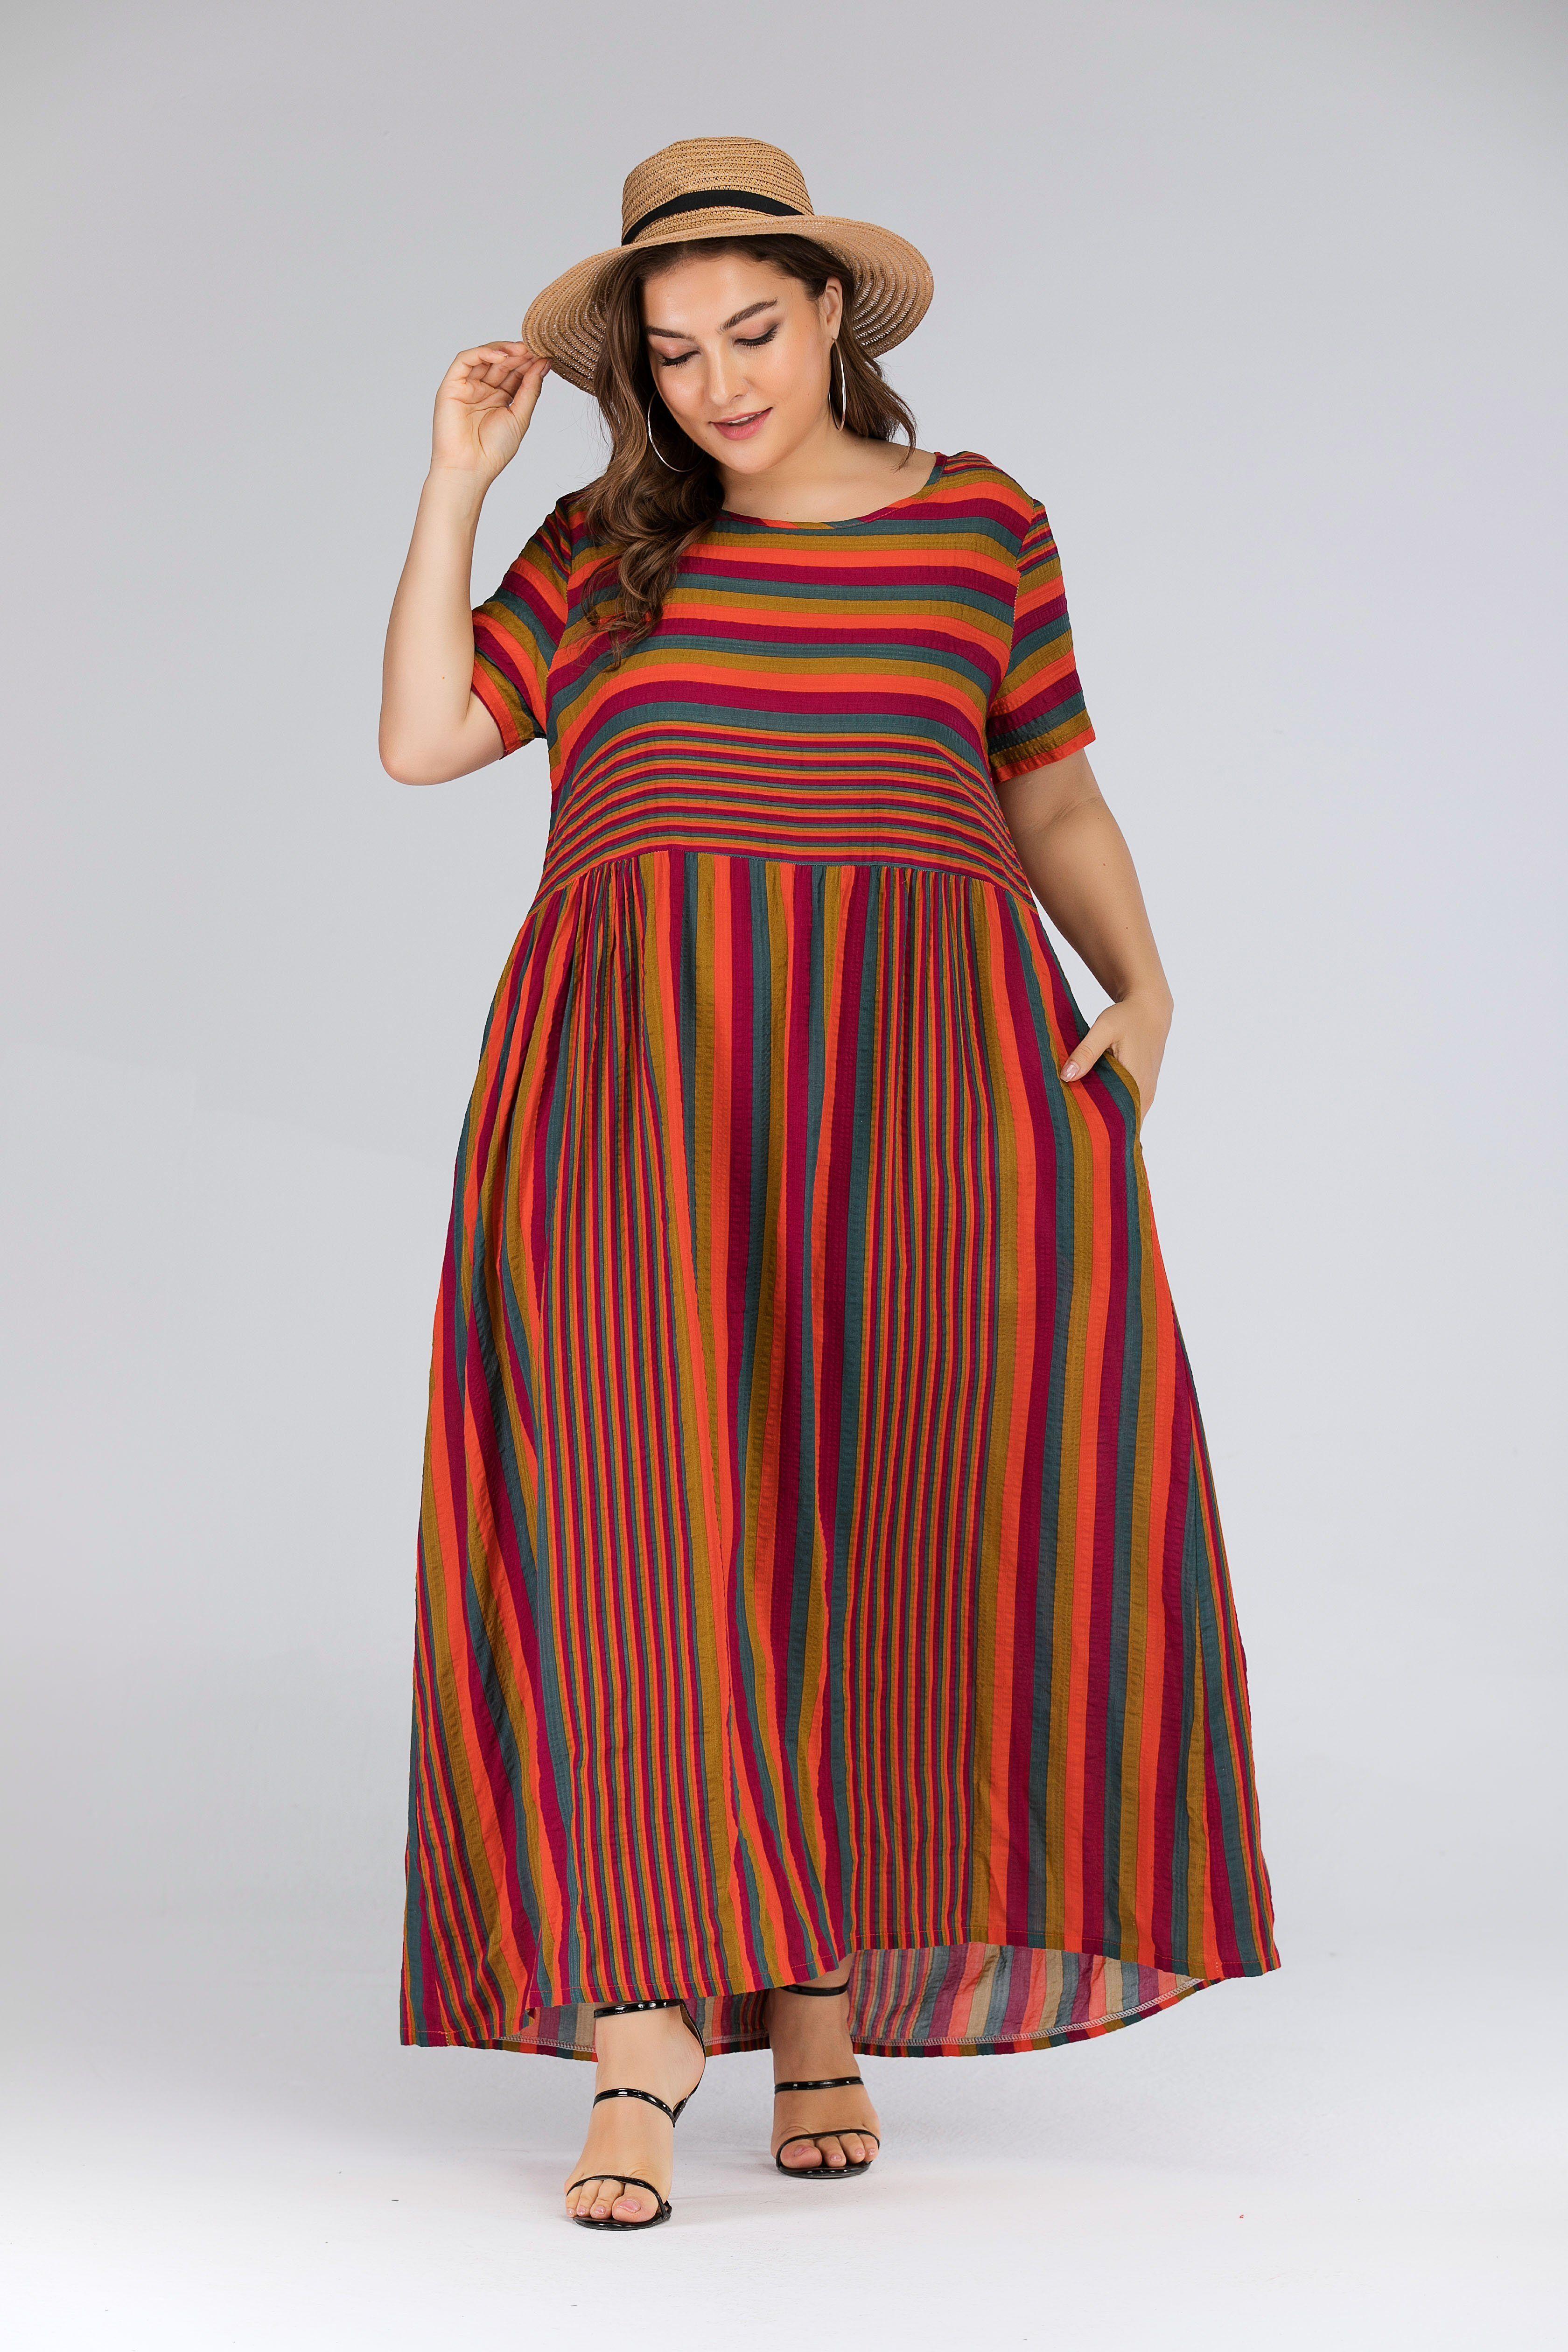 Pin By Doly Panduro On Vestidos De Dama In 2020 Maxi Dress Curvy Dress Plus Size Dresses [ 5040 x 3360 Pixel ]